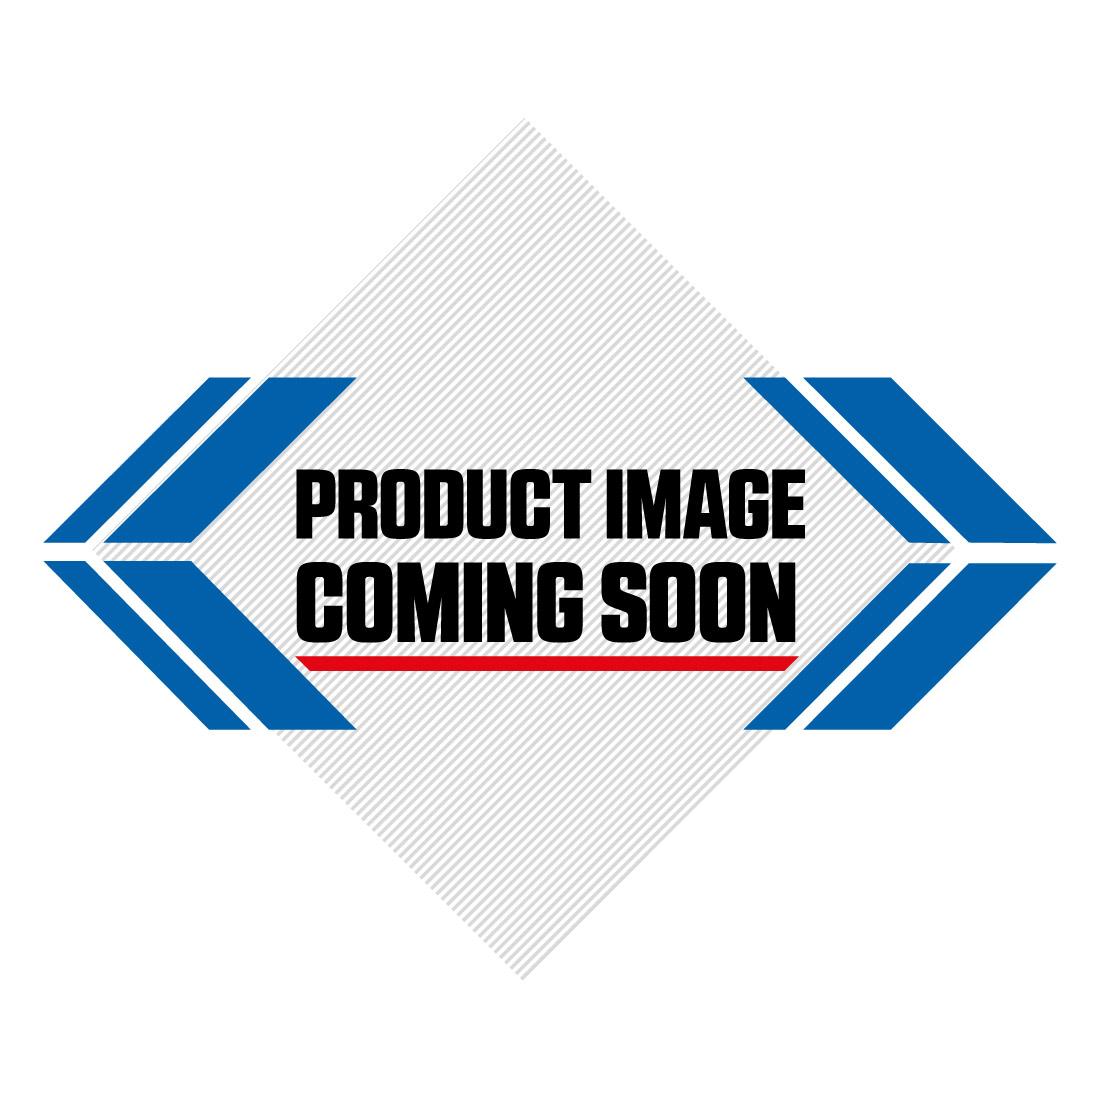 UFO Honda Radiator louvers CRF 250R (18-19) CRF 250RX (2019) OEM Factory Image-1